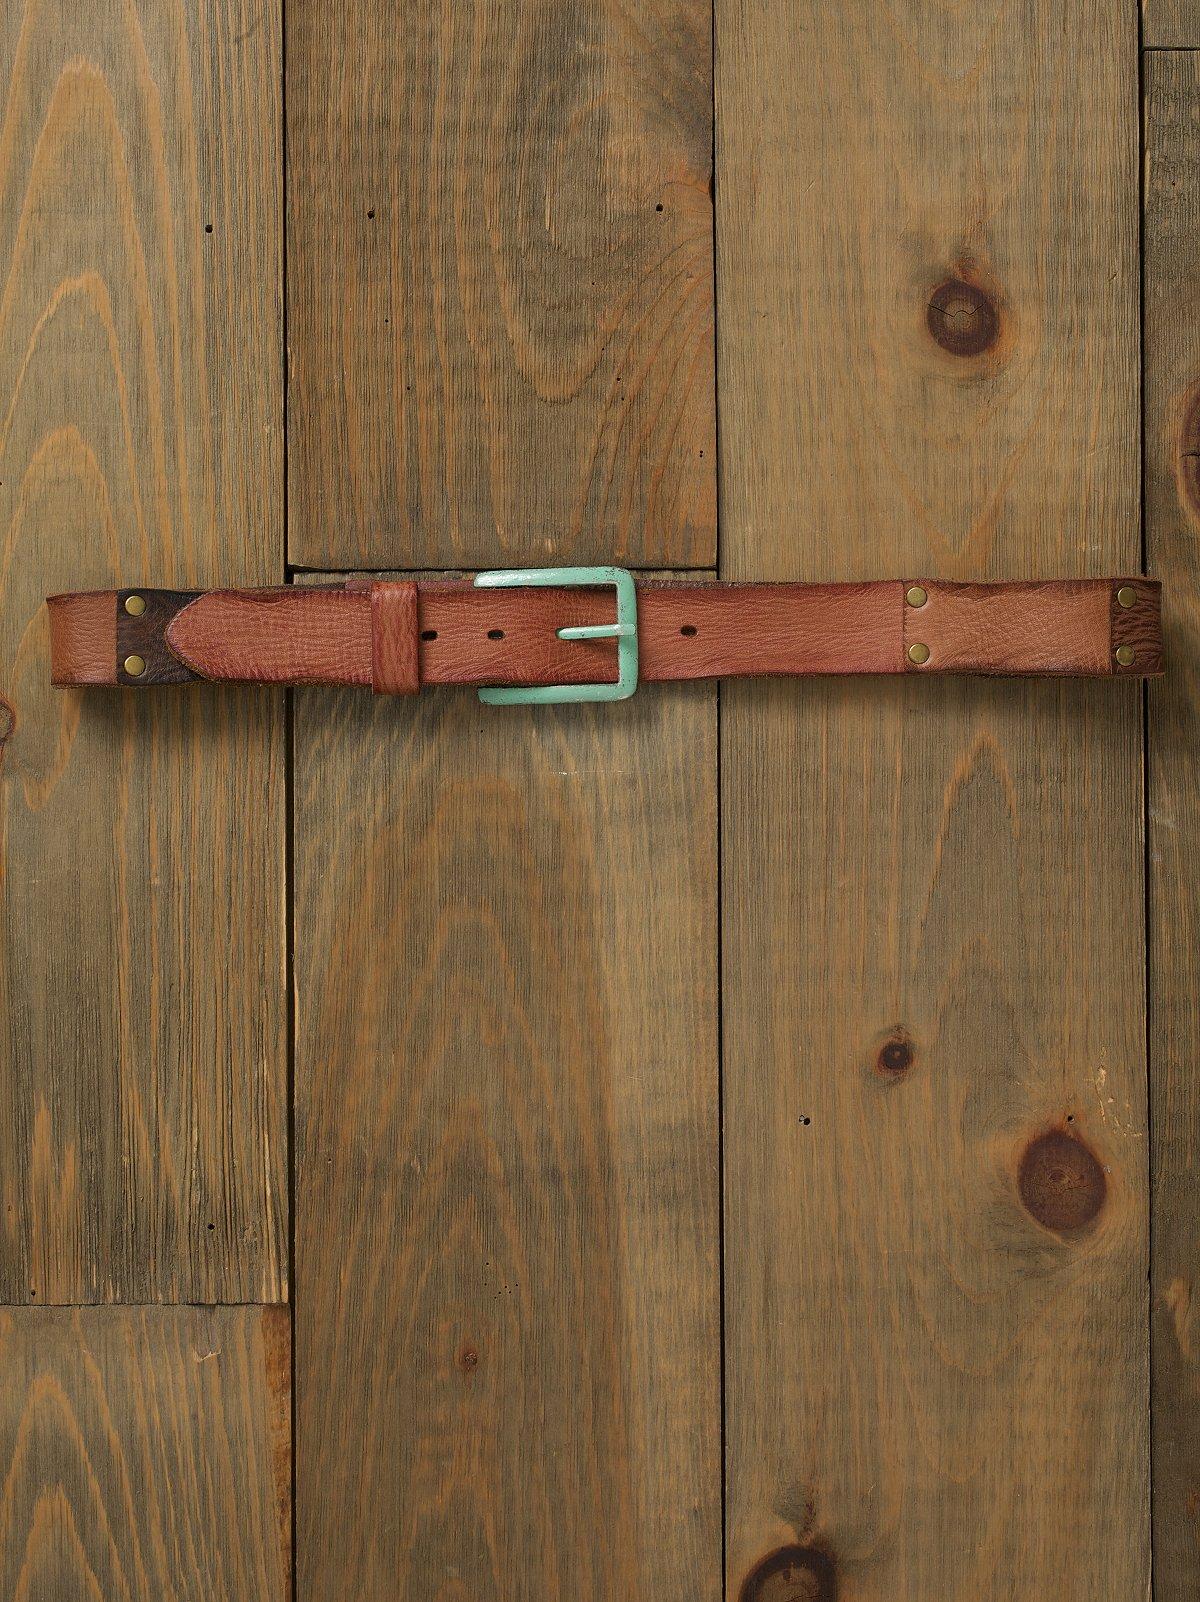 Patina Patched Belt